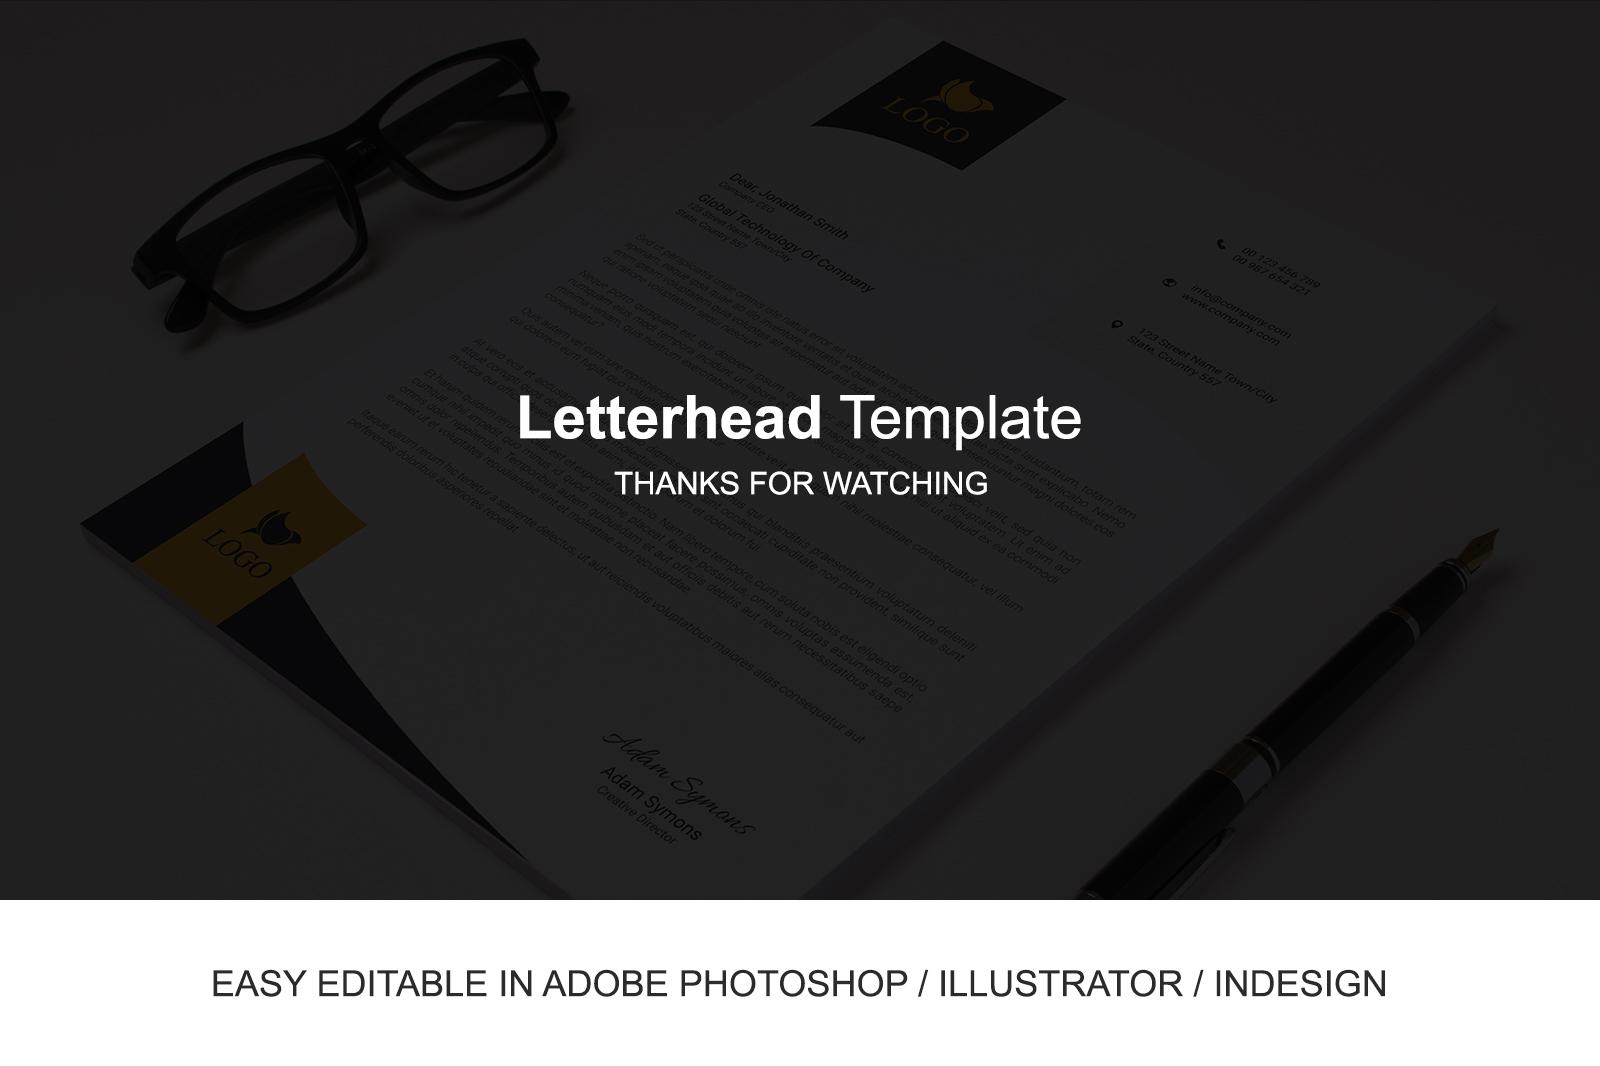 Letterhead Template